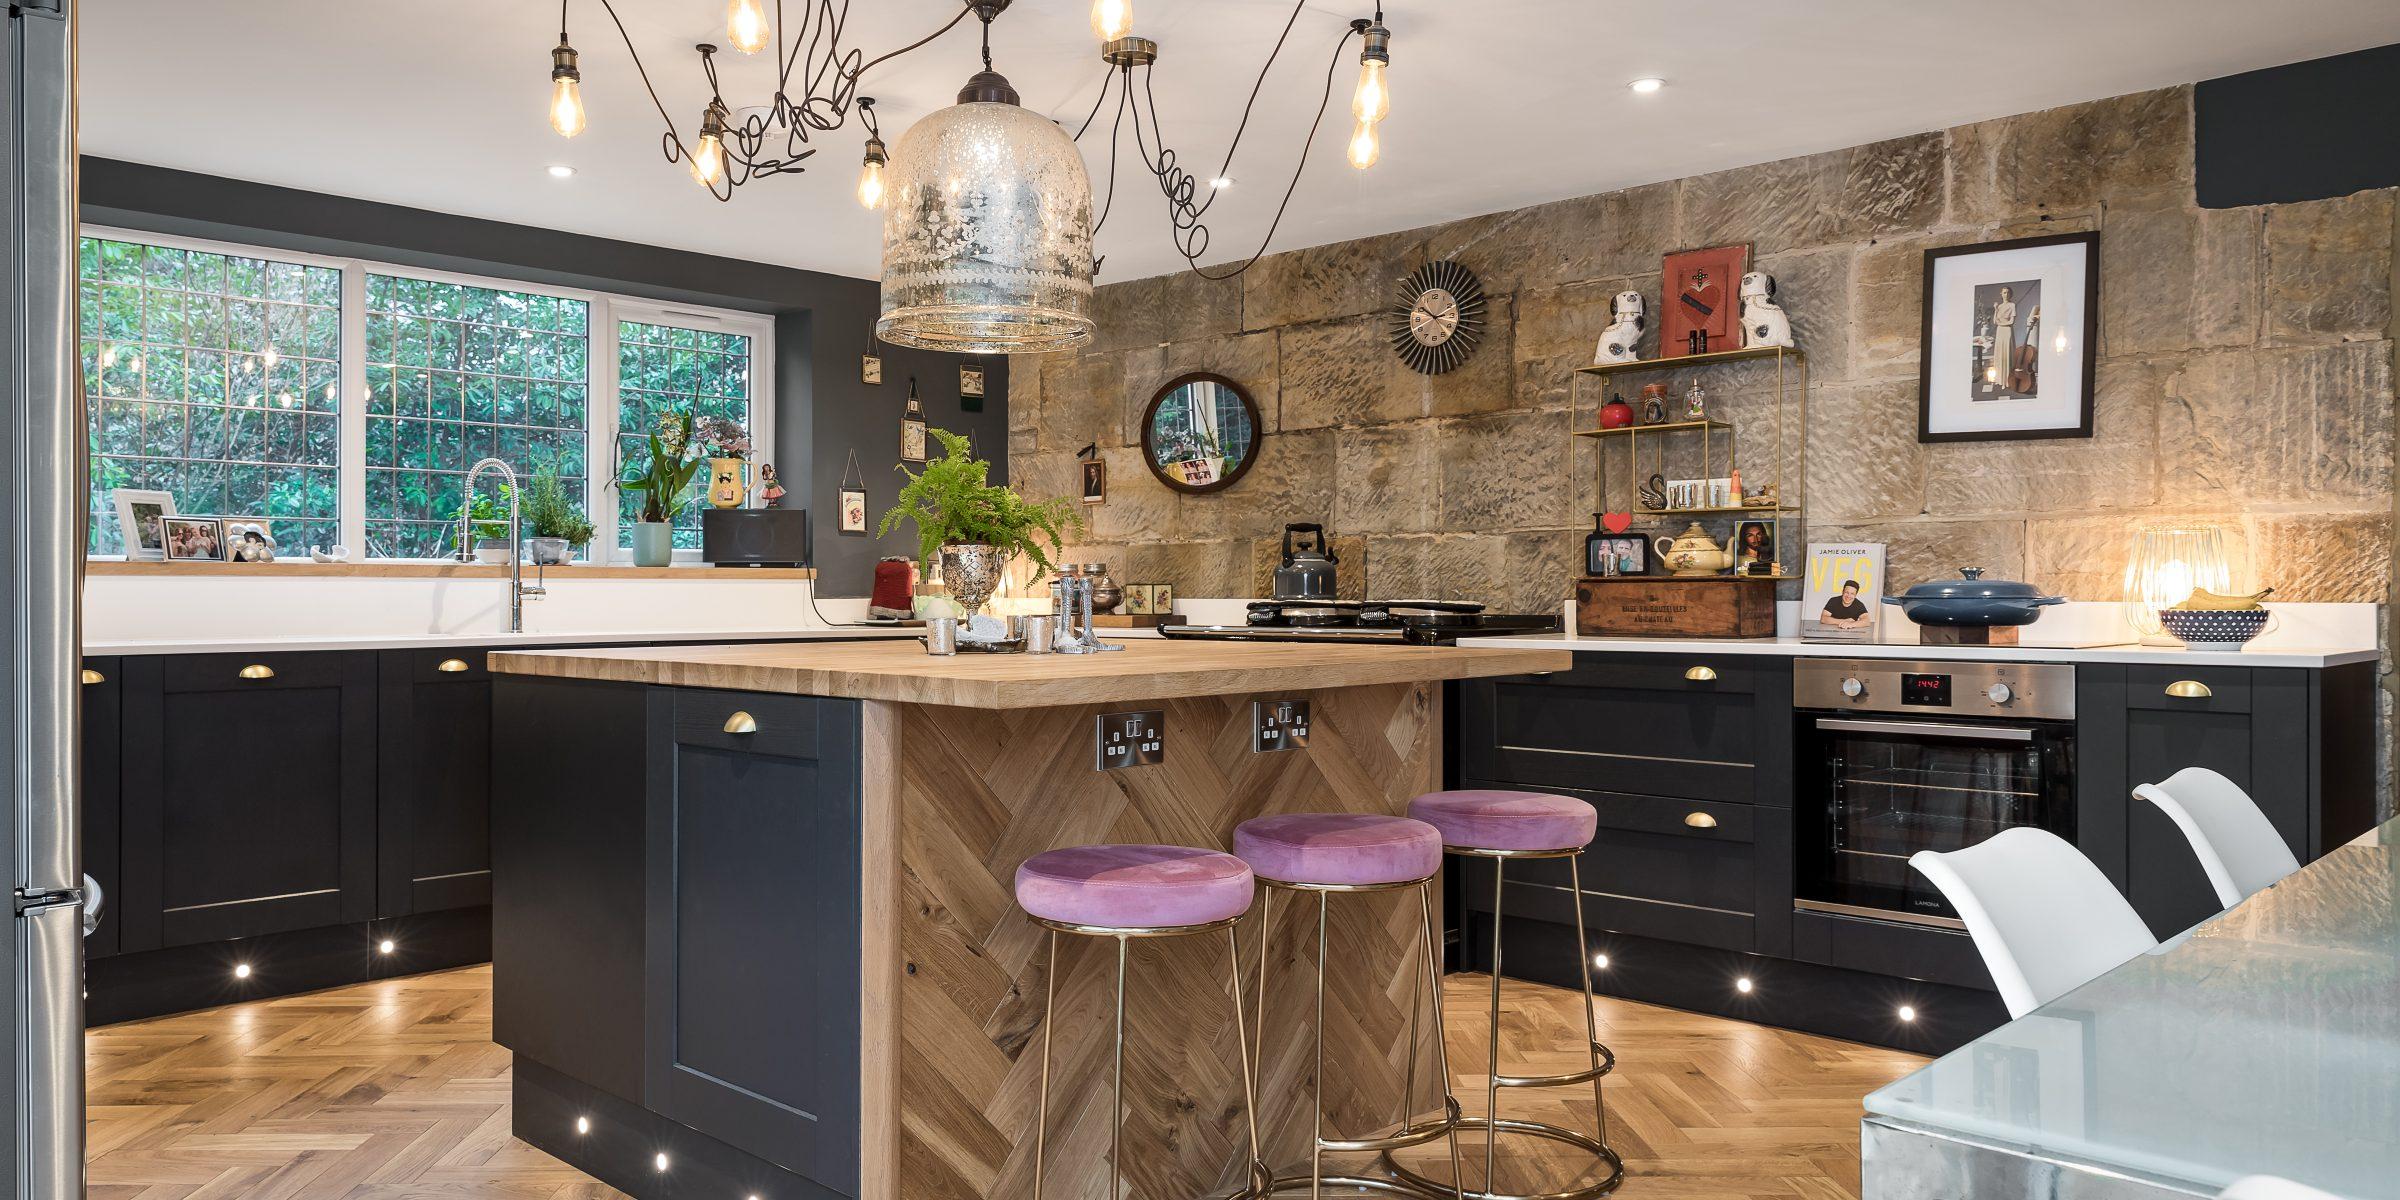 east sussex kitchen with herringbone wood floors